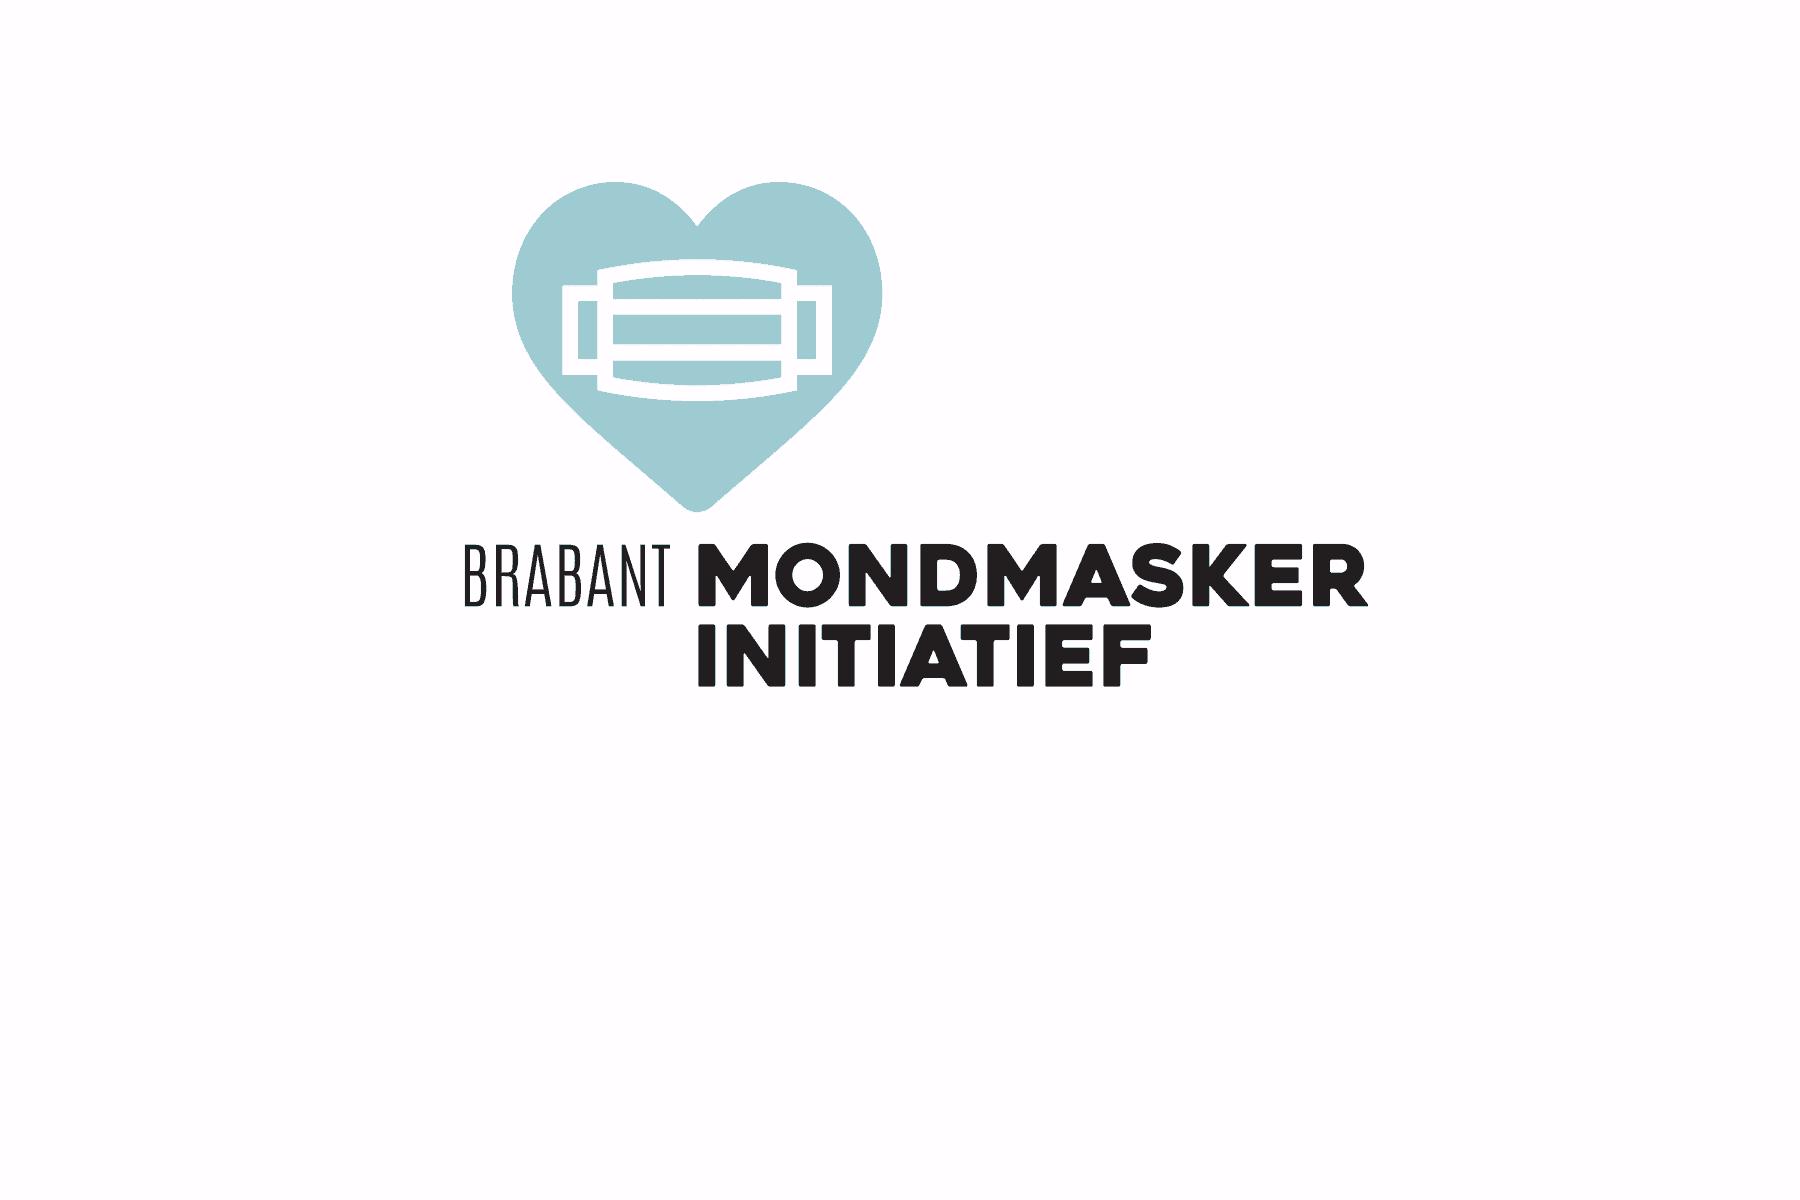 Brabant Mondmasker Initiatief logo